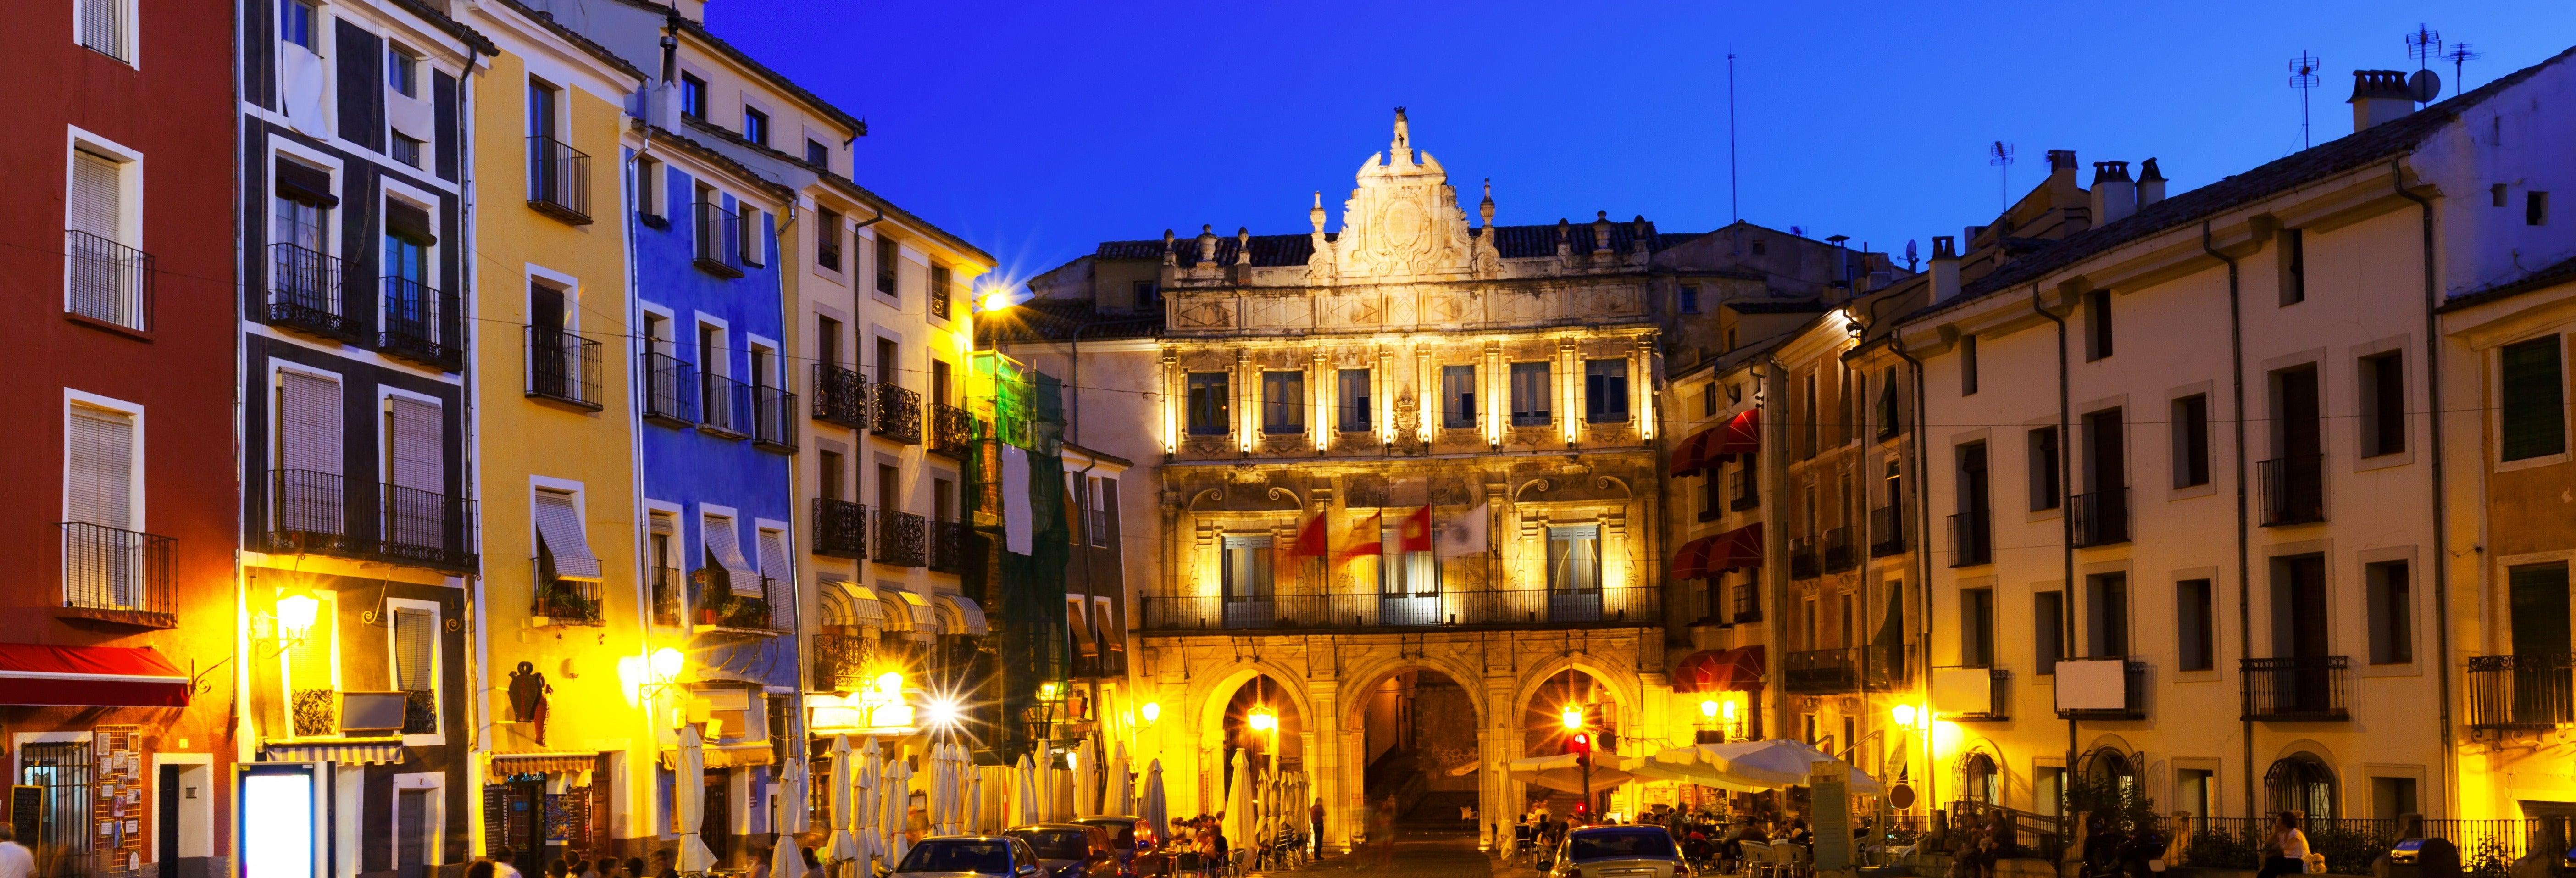 Tour dos mistérios e lendas de Cuenca